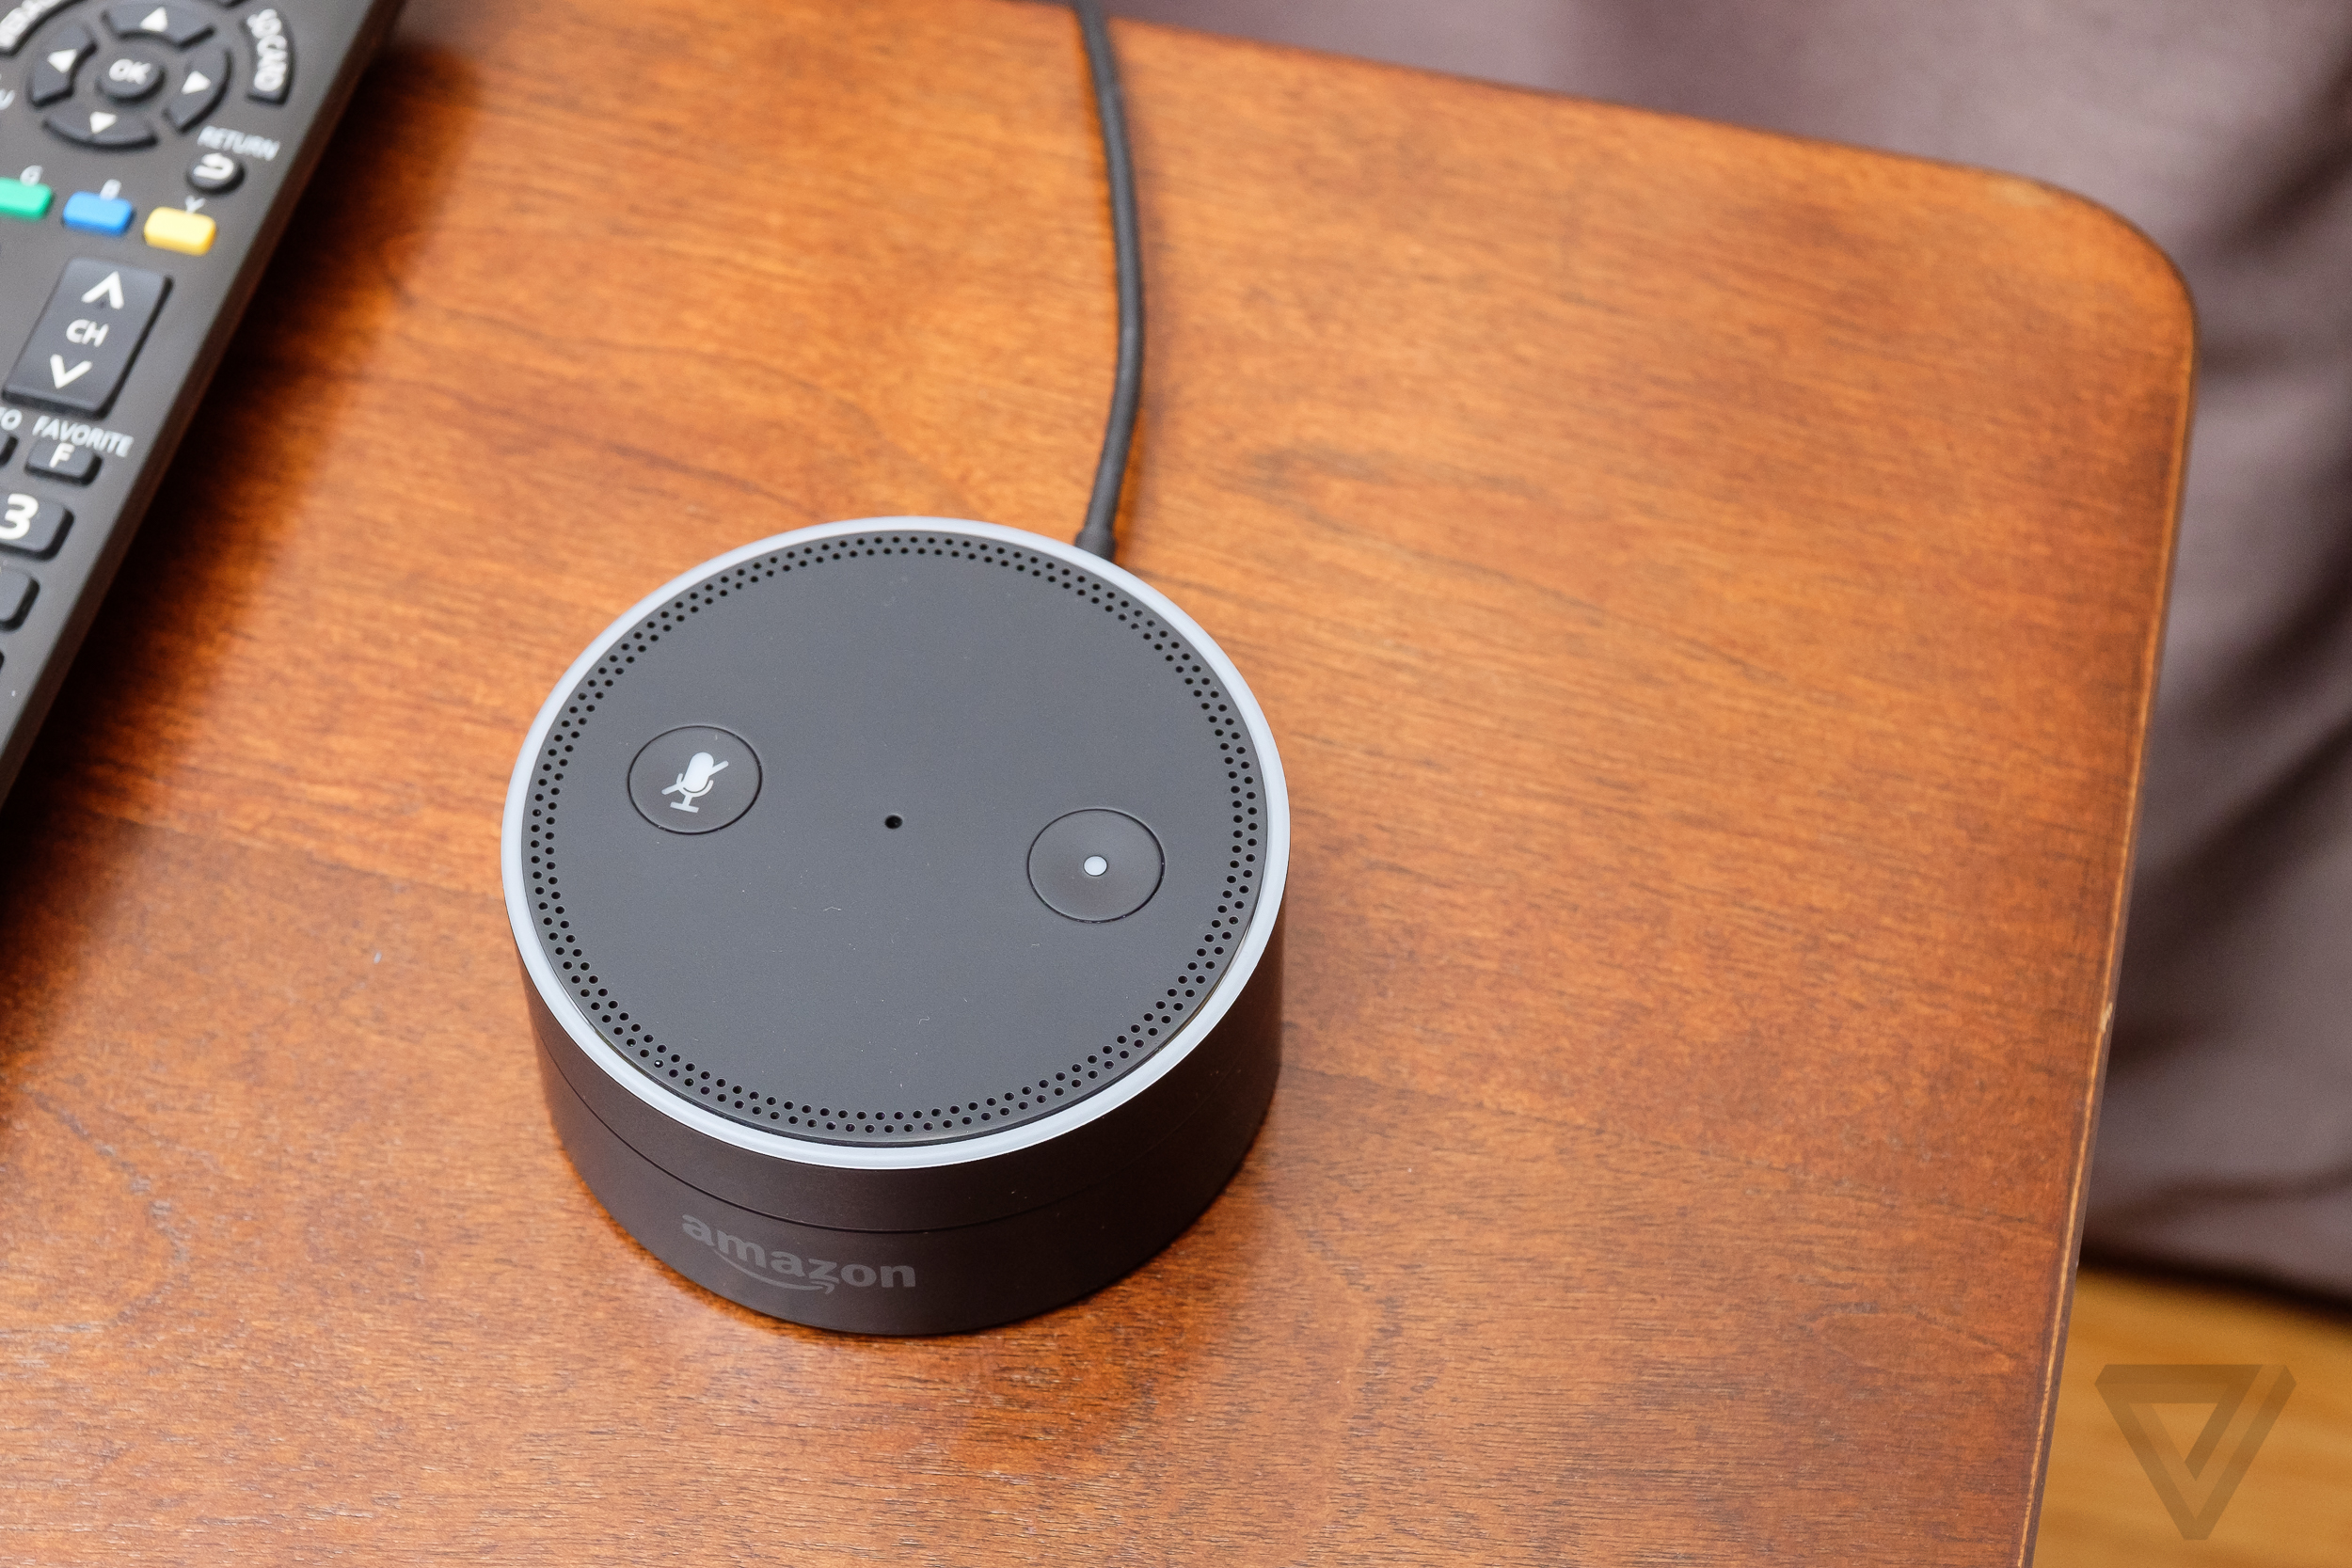 Amazon's Alexa can now add events to Google Calendar